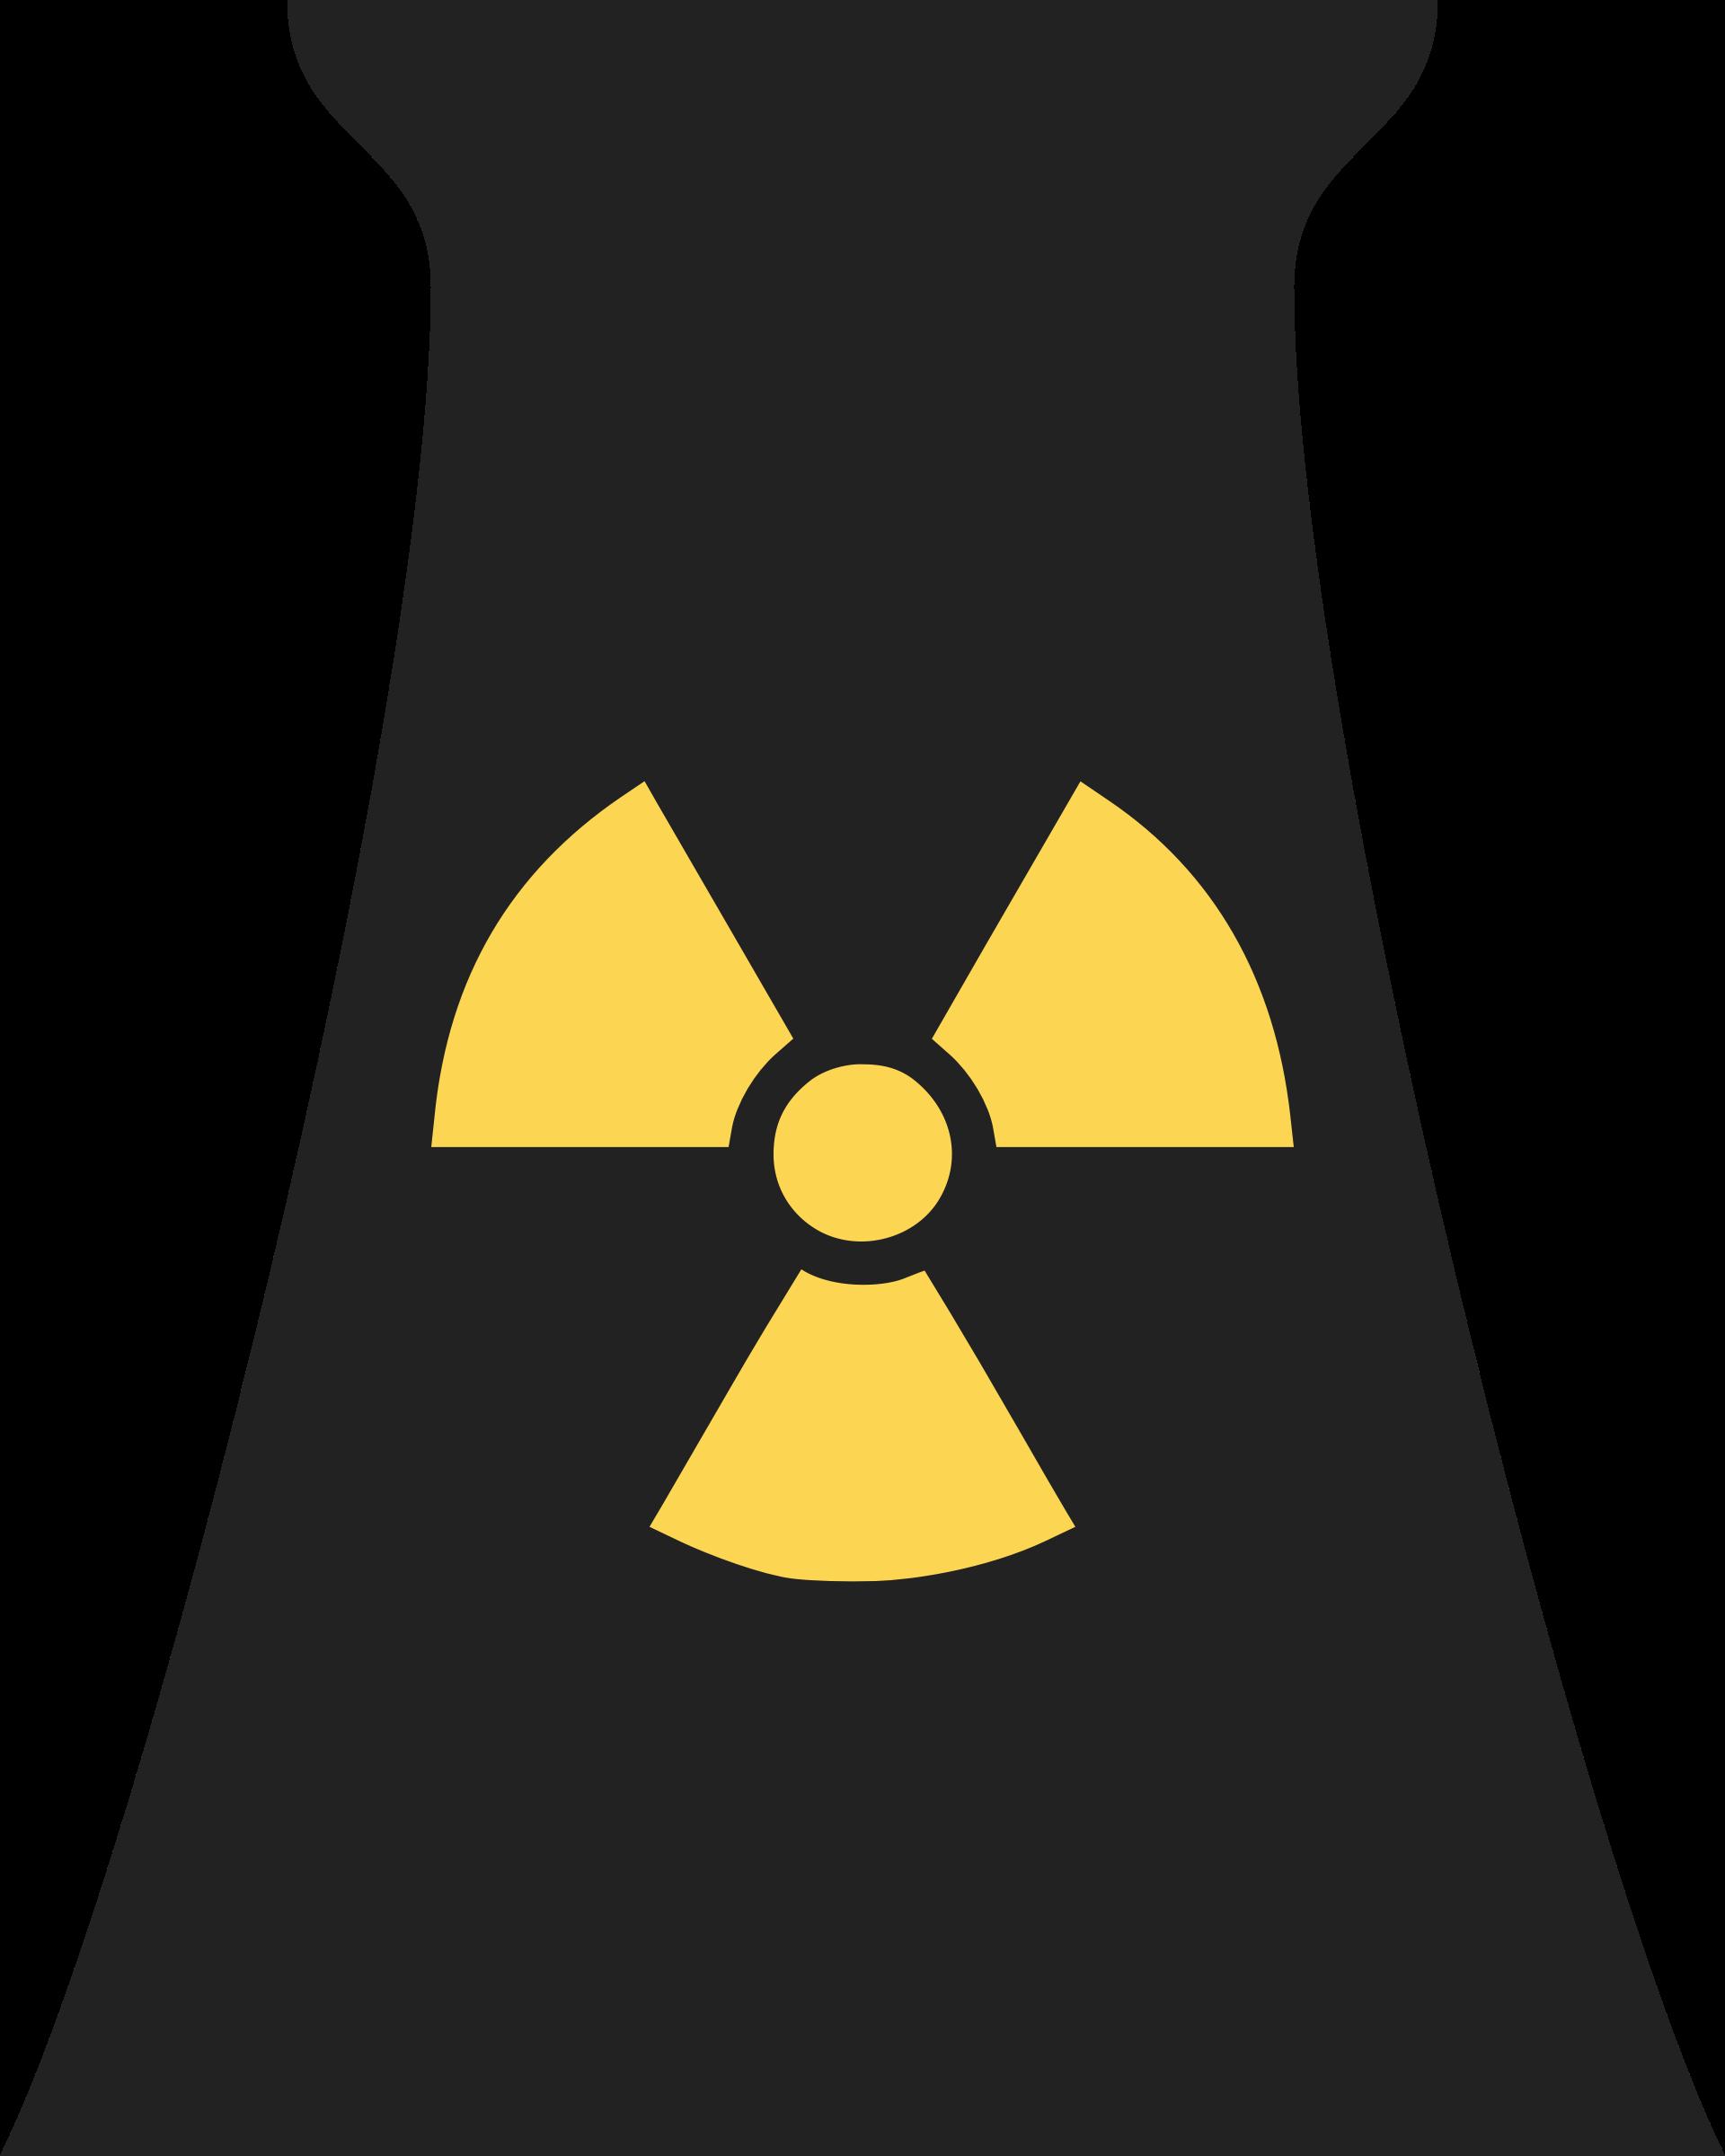 atomkraftwerk clipart - photo #9